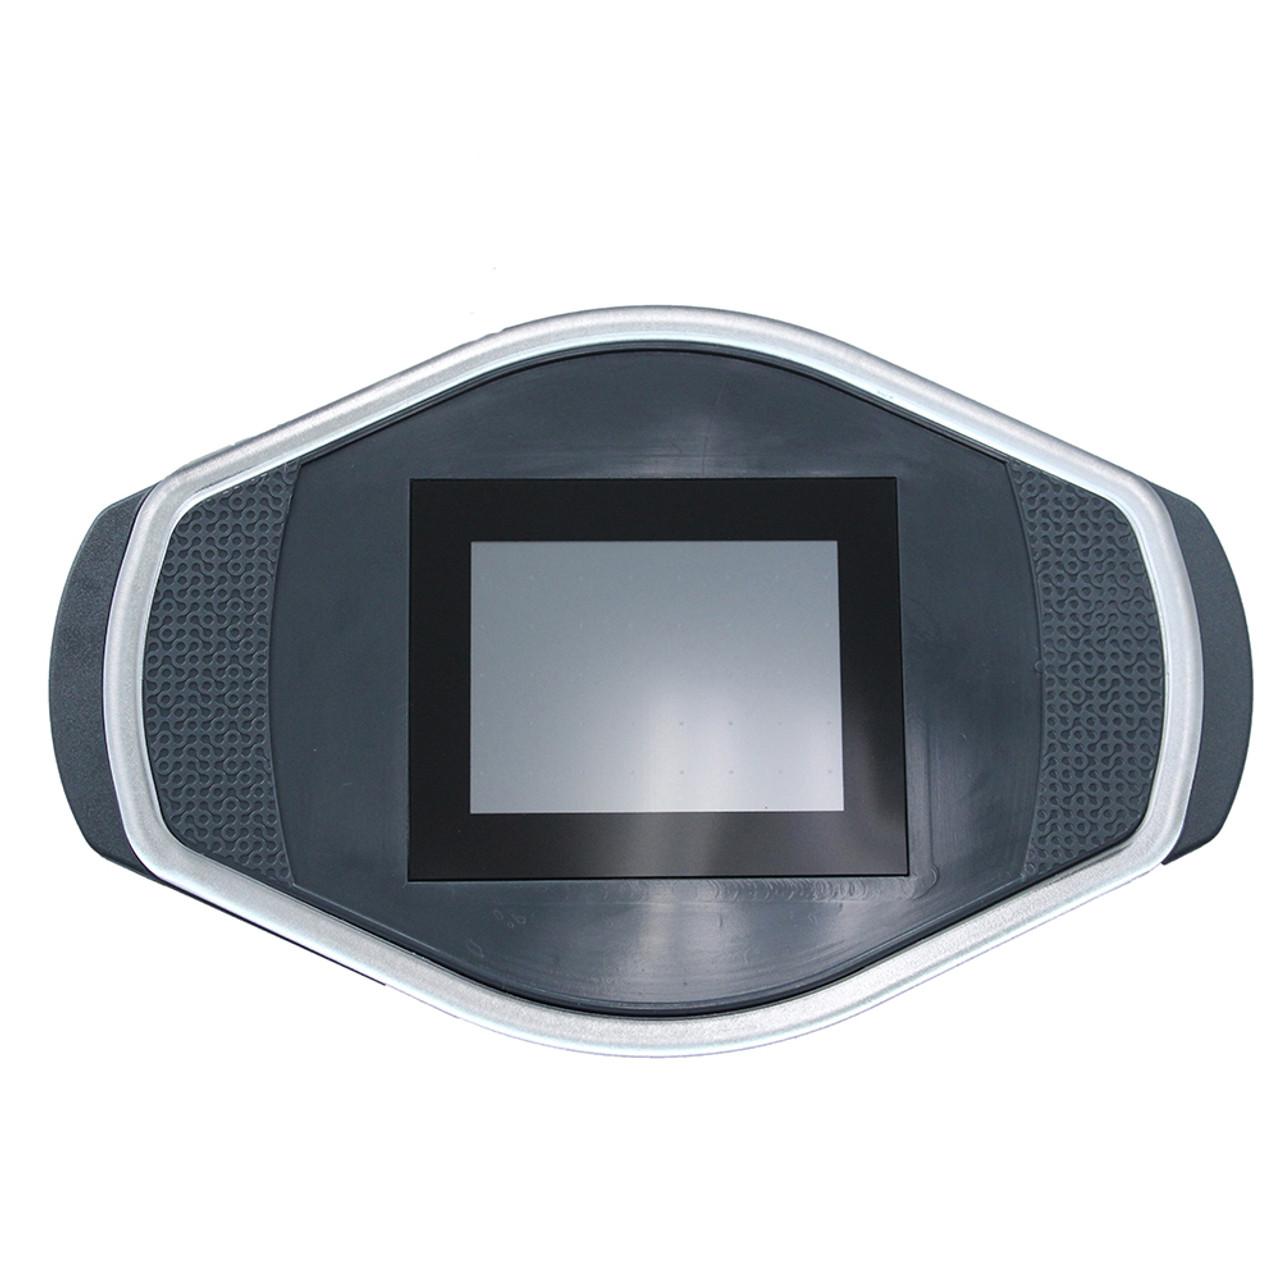 NLA - Master Spa - X310220 - Twilight Topside Control